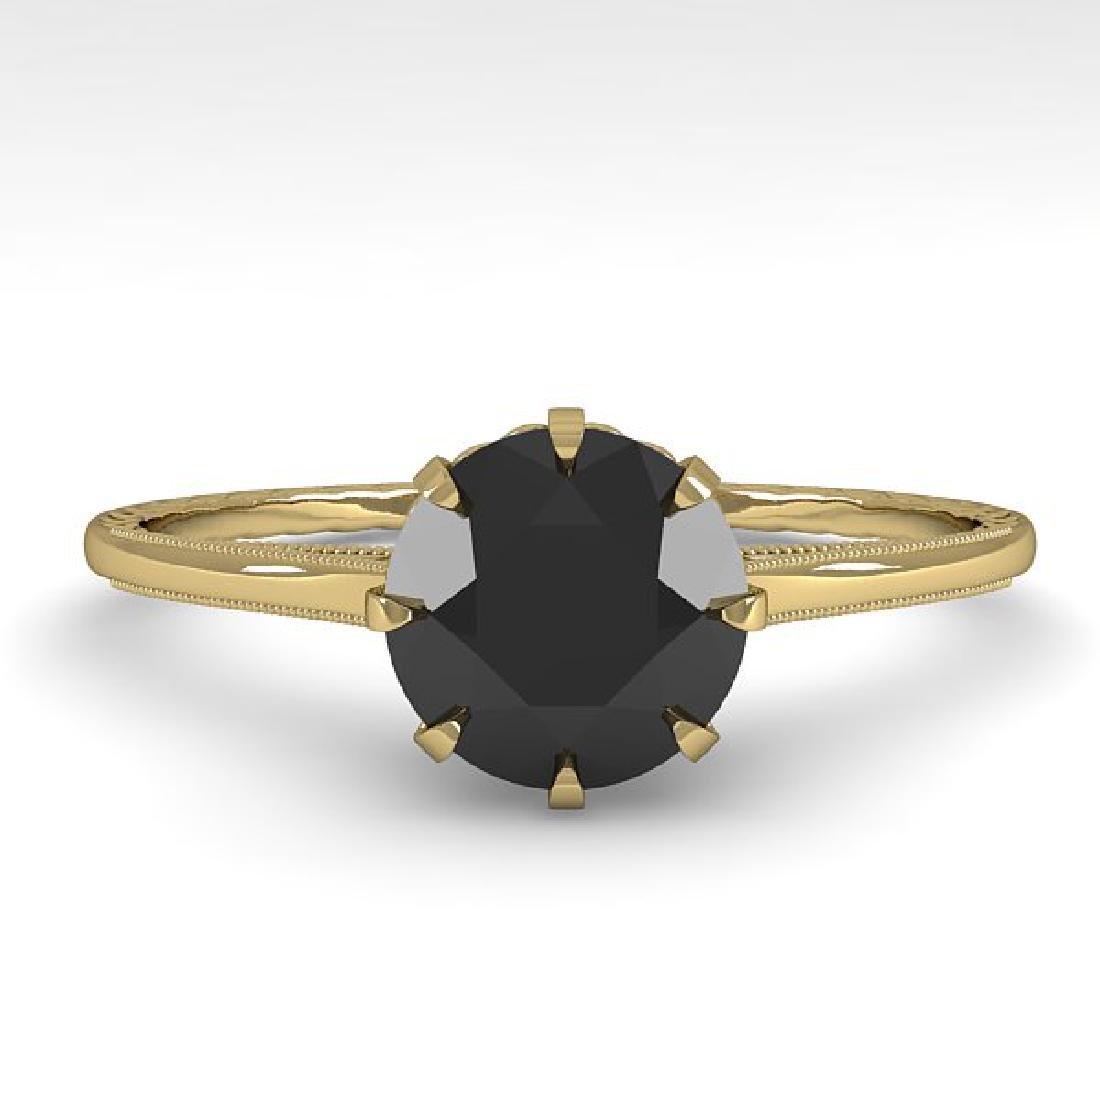 1.0 CTW Black Diamond Solitaire Ring Vintage 14K Yellow